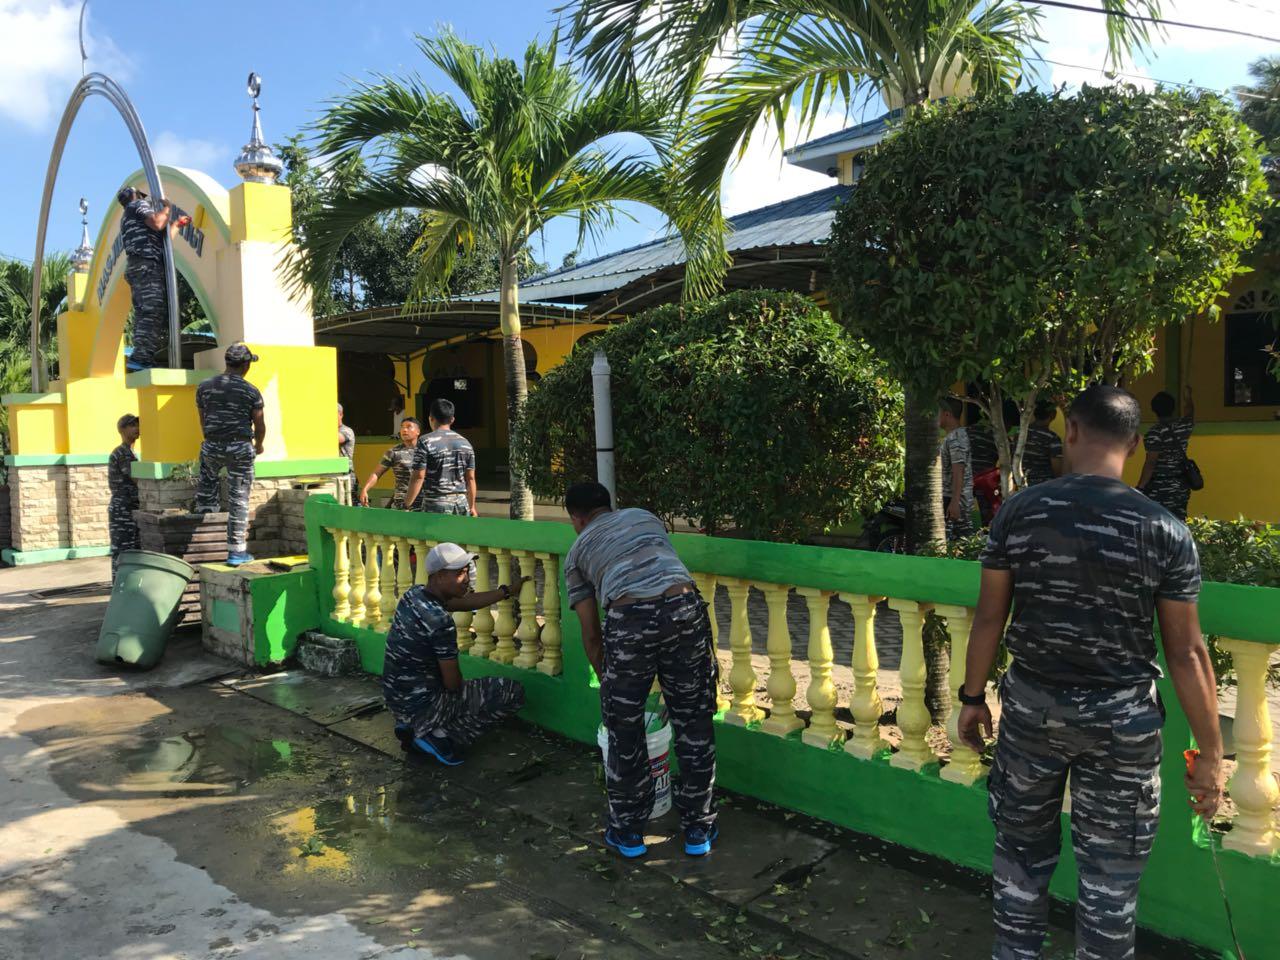 Jelang Bulan Ramadhan, Satkat Armabar Goro Bersihkan Mesjid Jami Tanjunguban